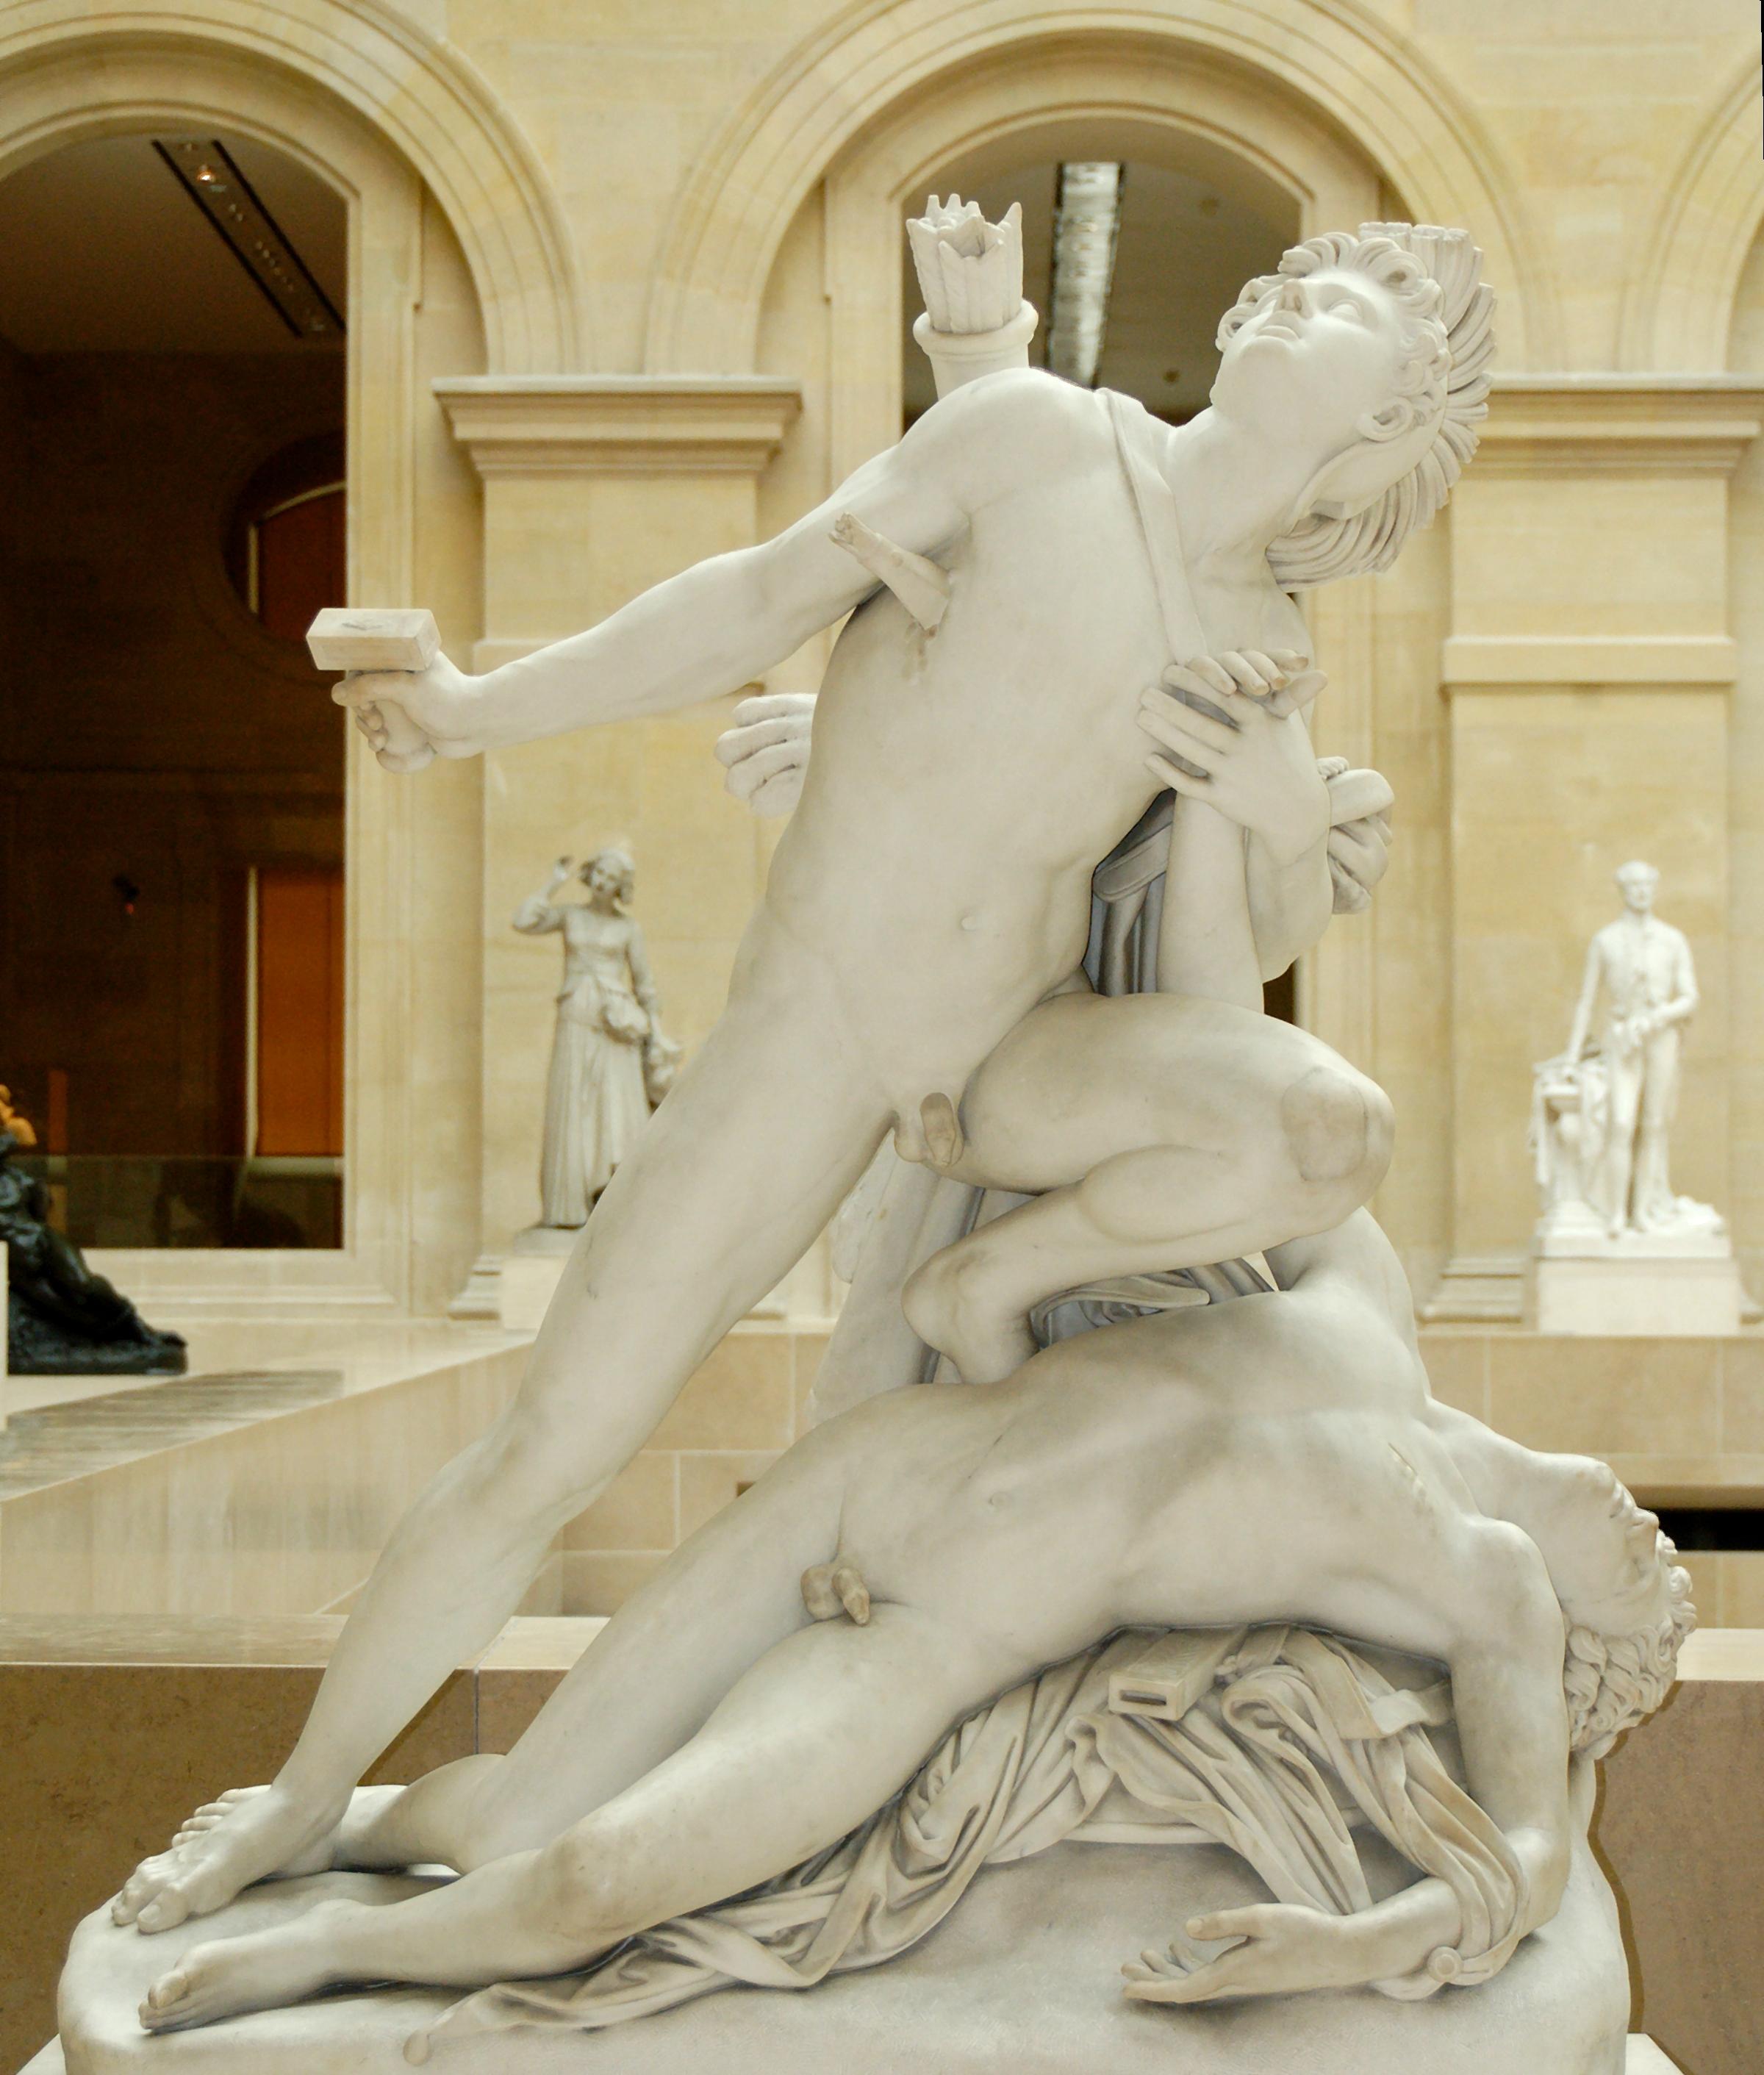 fantasie sessuali degli uomini badoo italiano roma